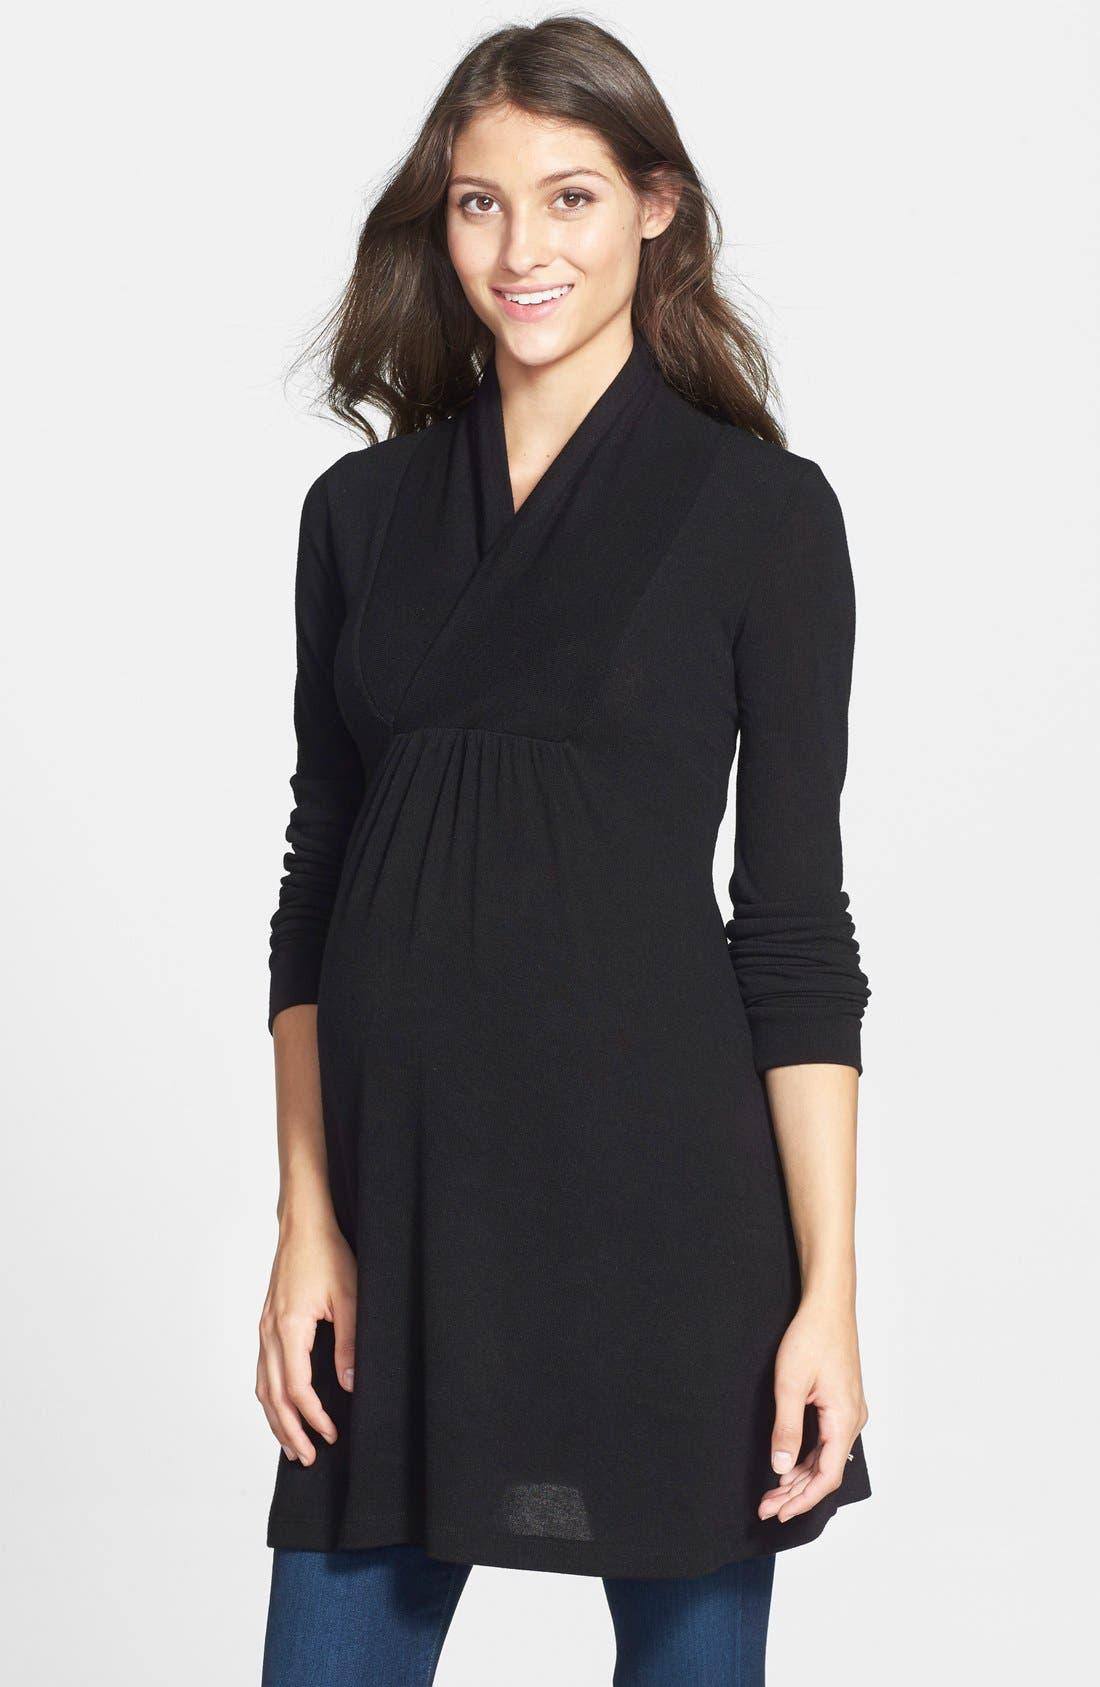 Alternate Image 1 Selected - Nom Maternity 'Tanya' Jersey Maternity Tunic